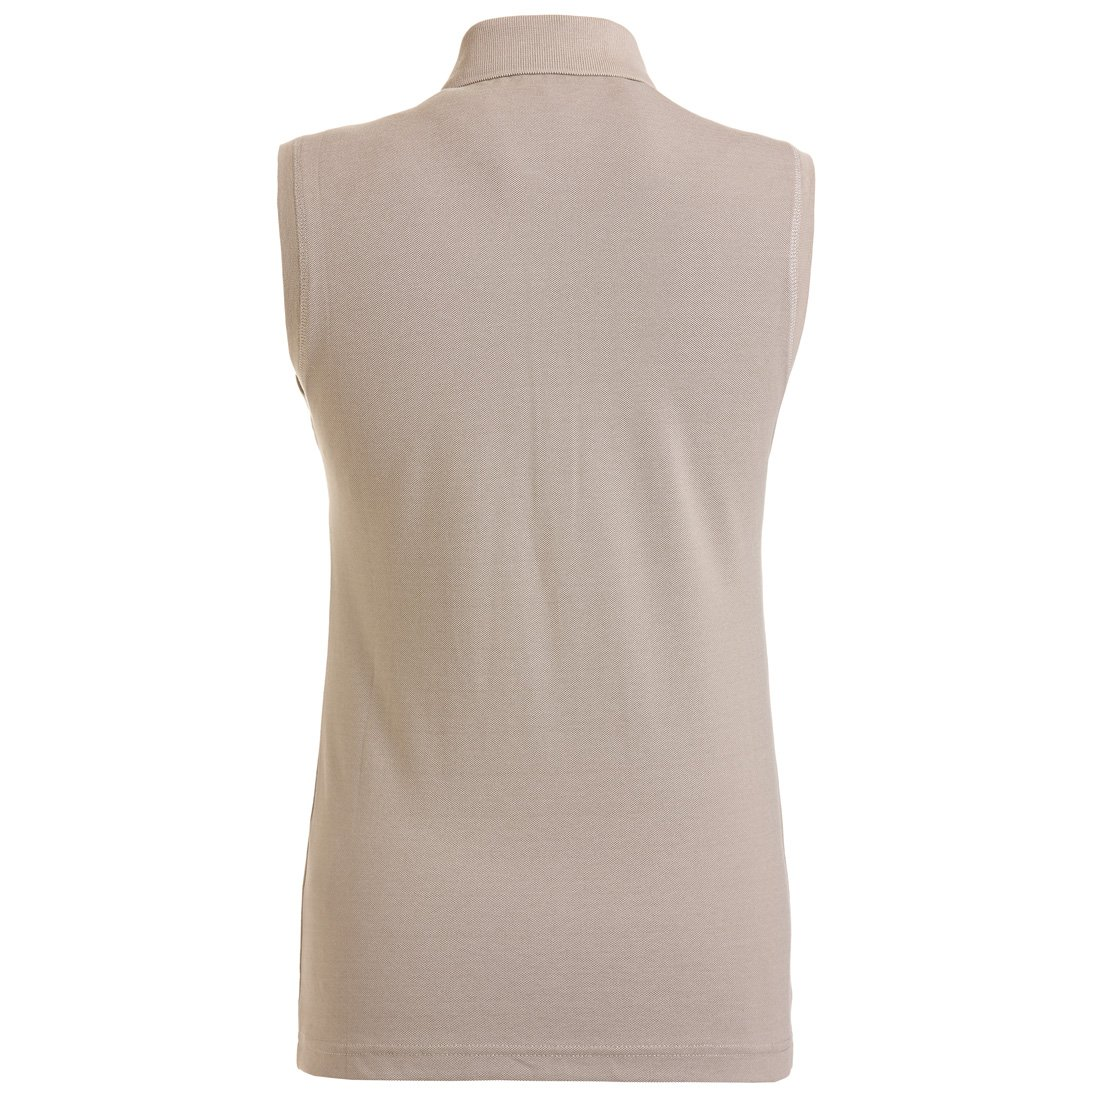 b478c77e8d5b5d Golfino Ladies Sleeveless Golf Polo Shirt Slim Fit Sun Protection ...